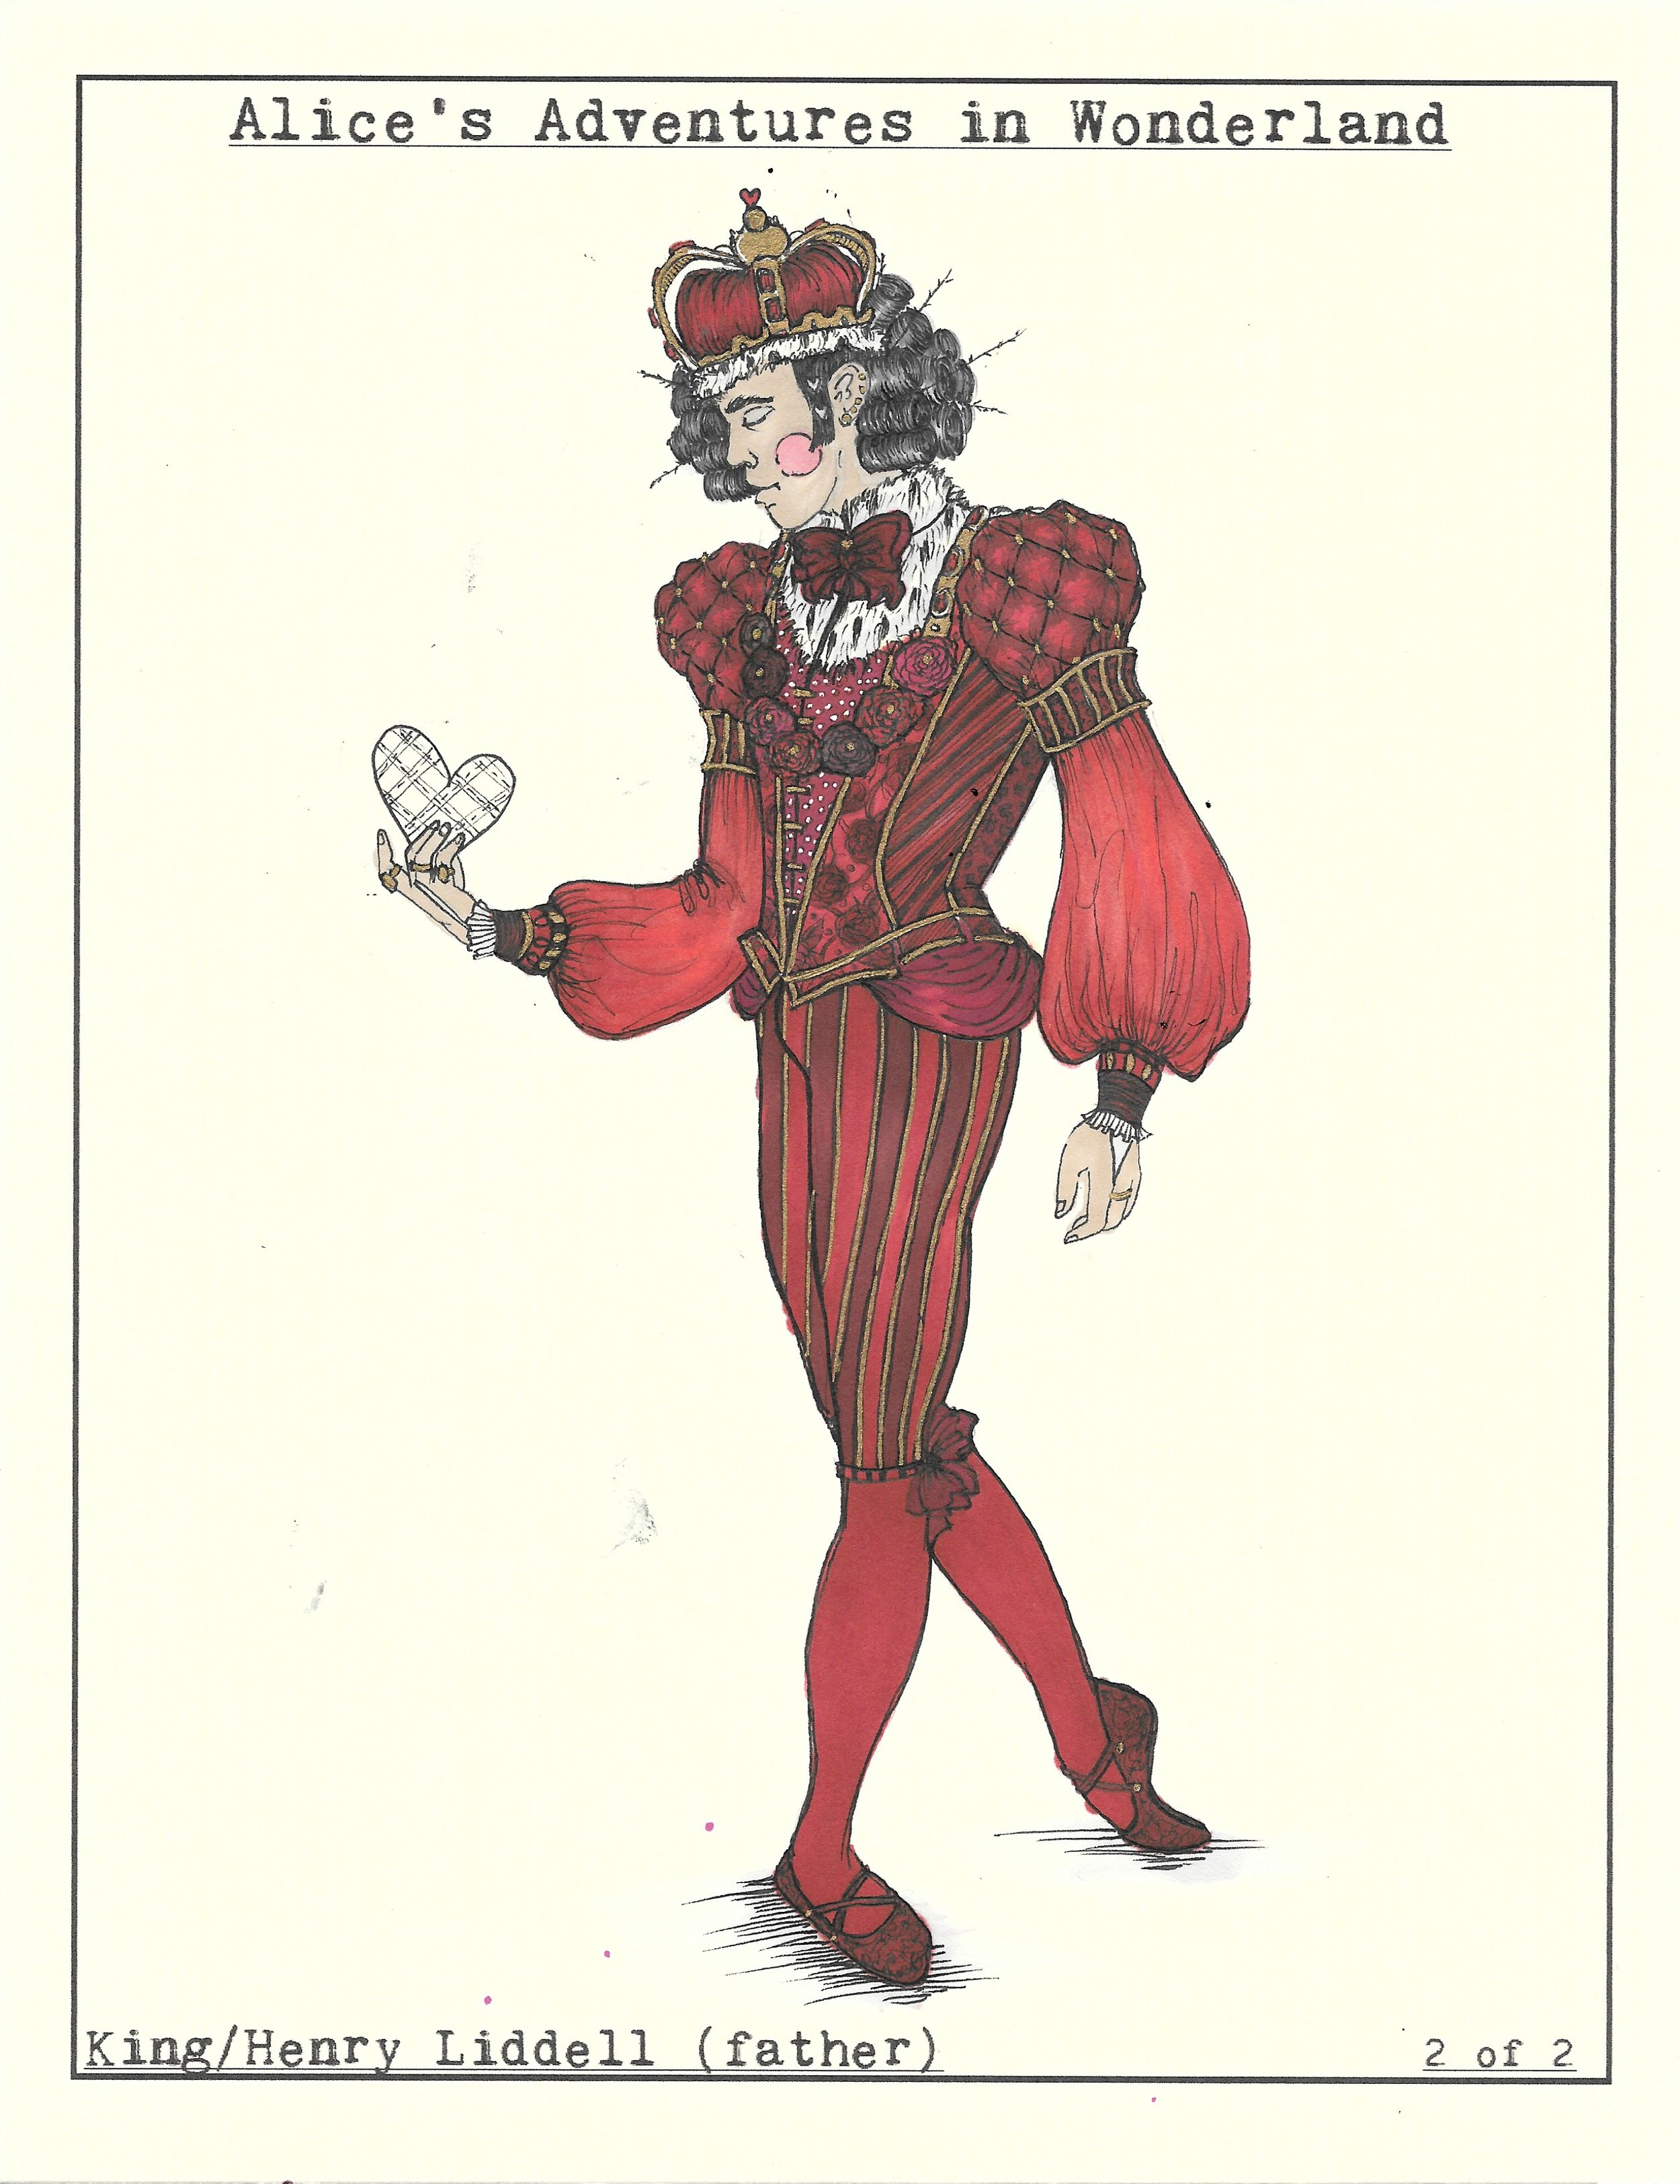 King of Hearts 2 of 2. Wonderland